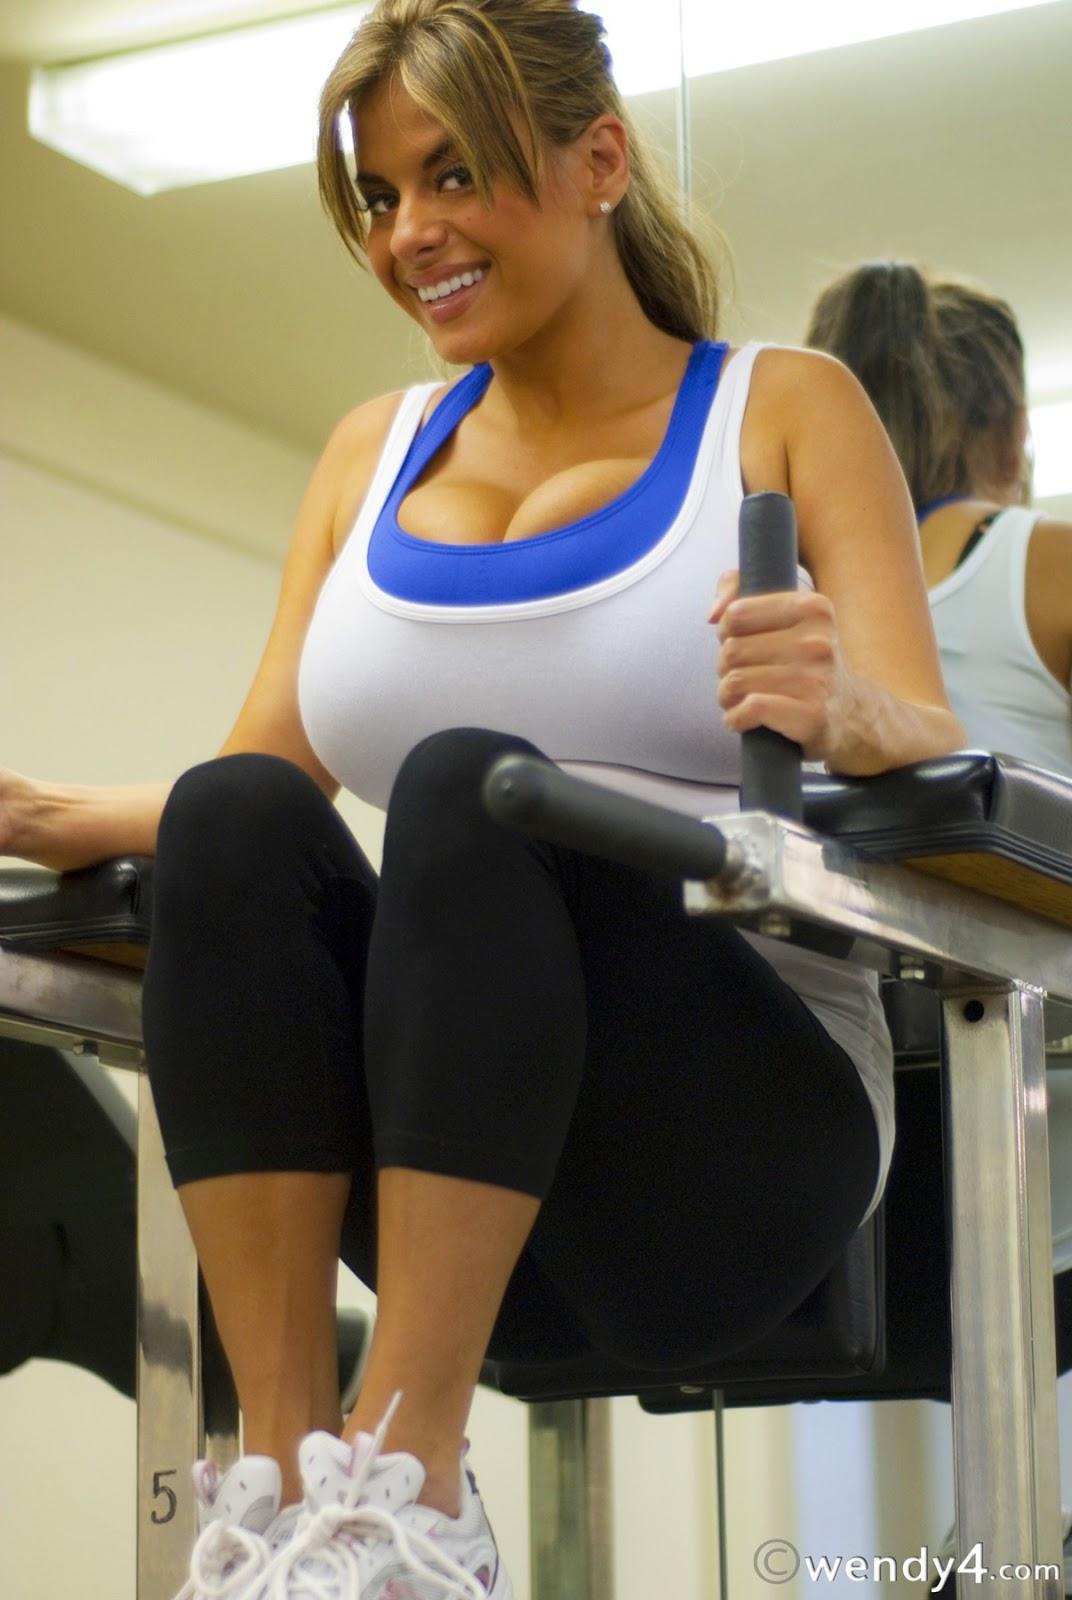 Wendy-fiore-fitness-2.jpg